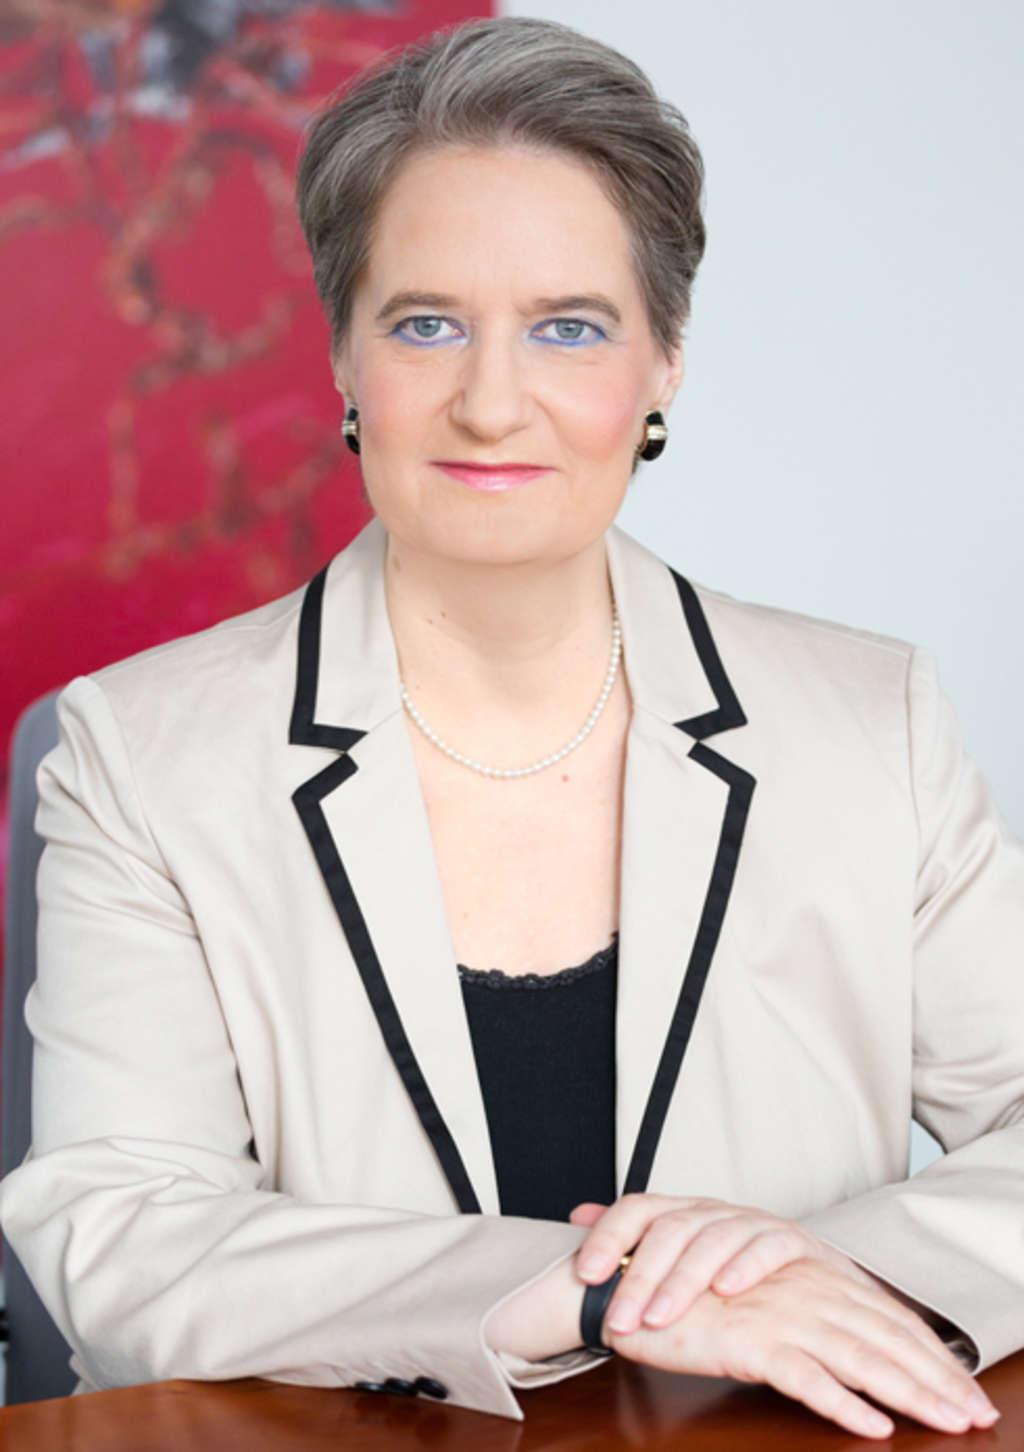 Susanne Laugwitz Aulbach